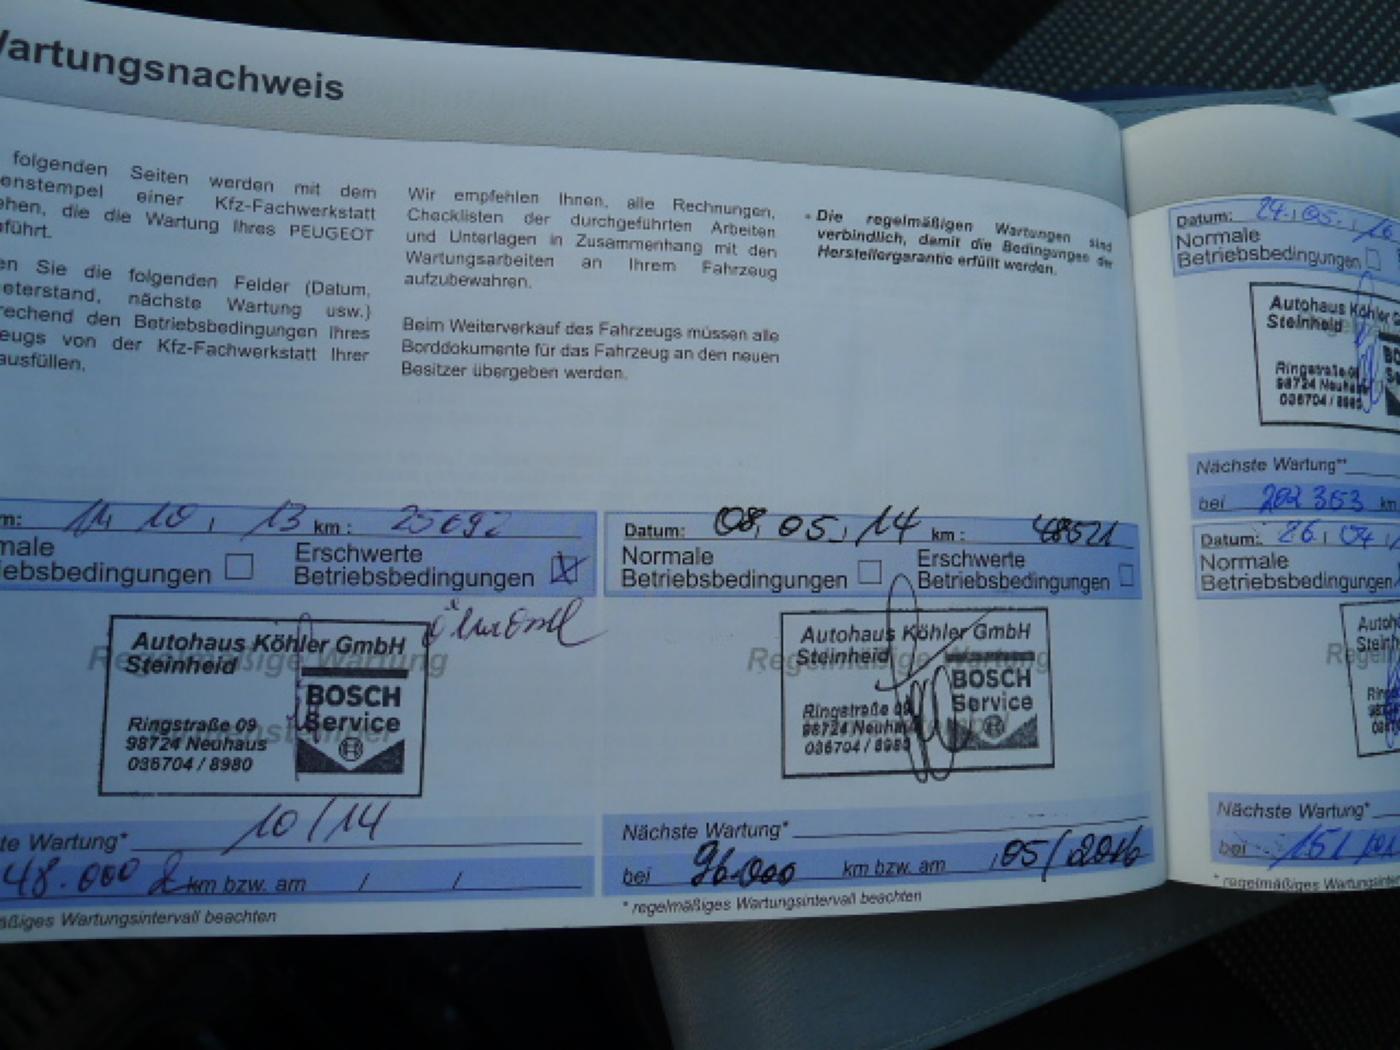 Peugeot Boxer 2.2 HDI L1H1 Klima Akce!!! Novinka - 14